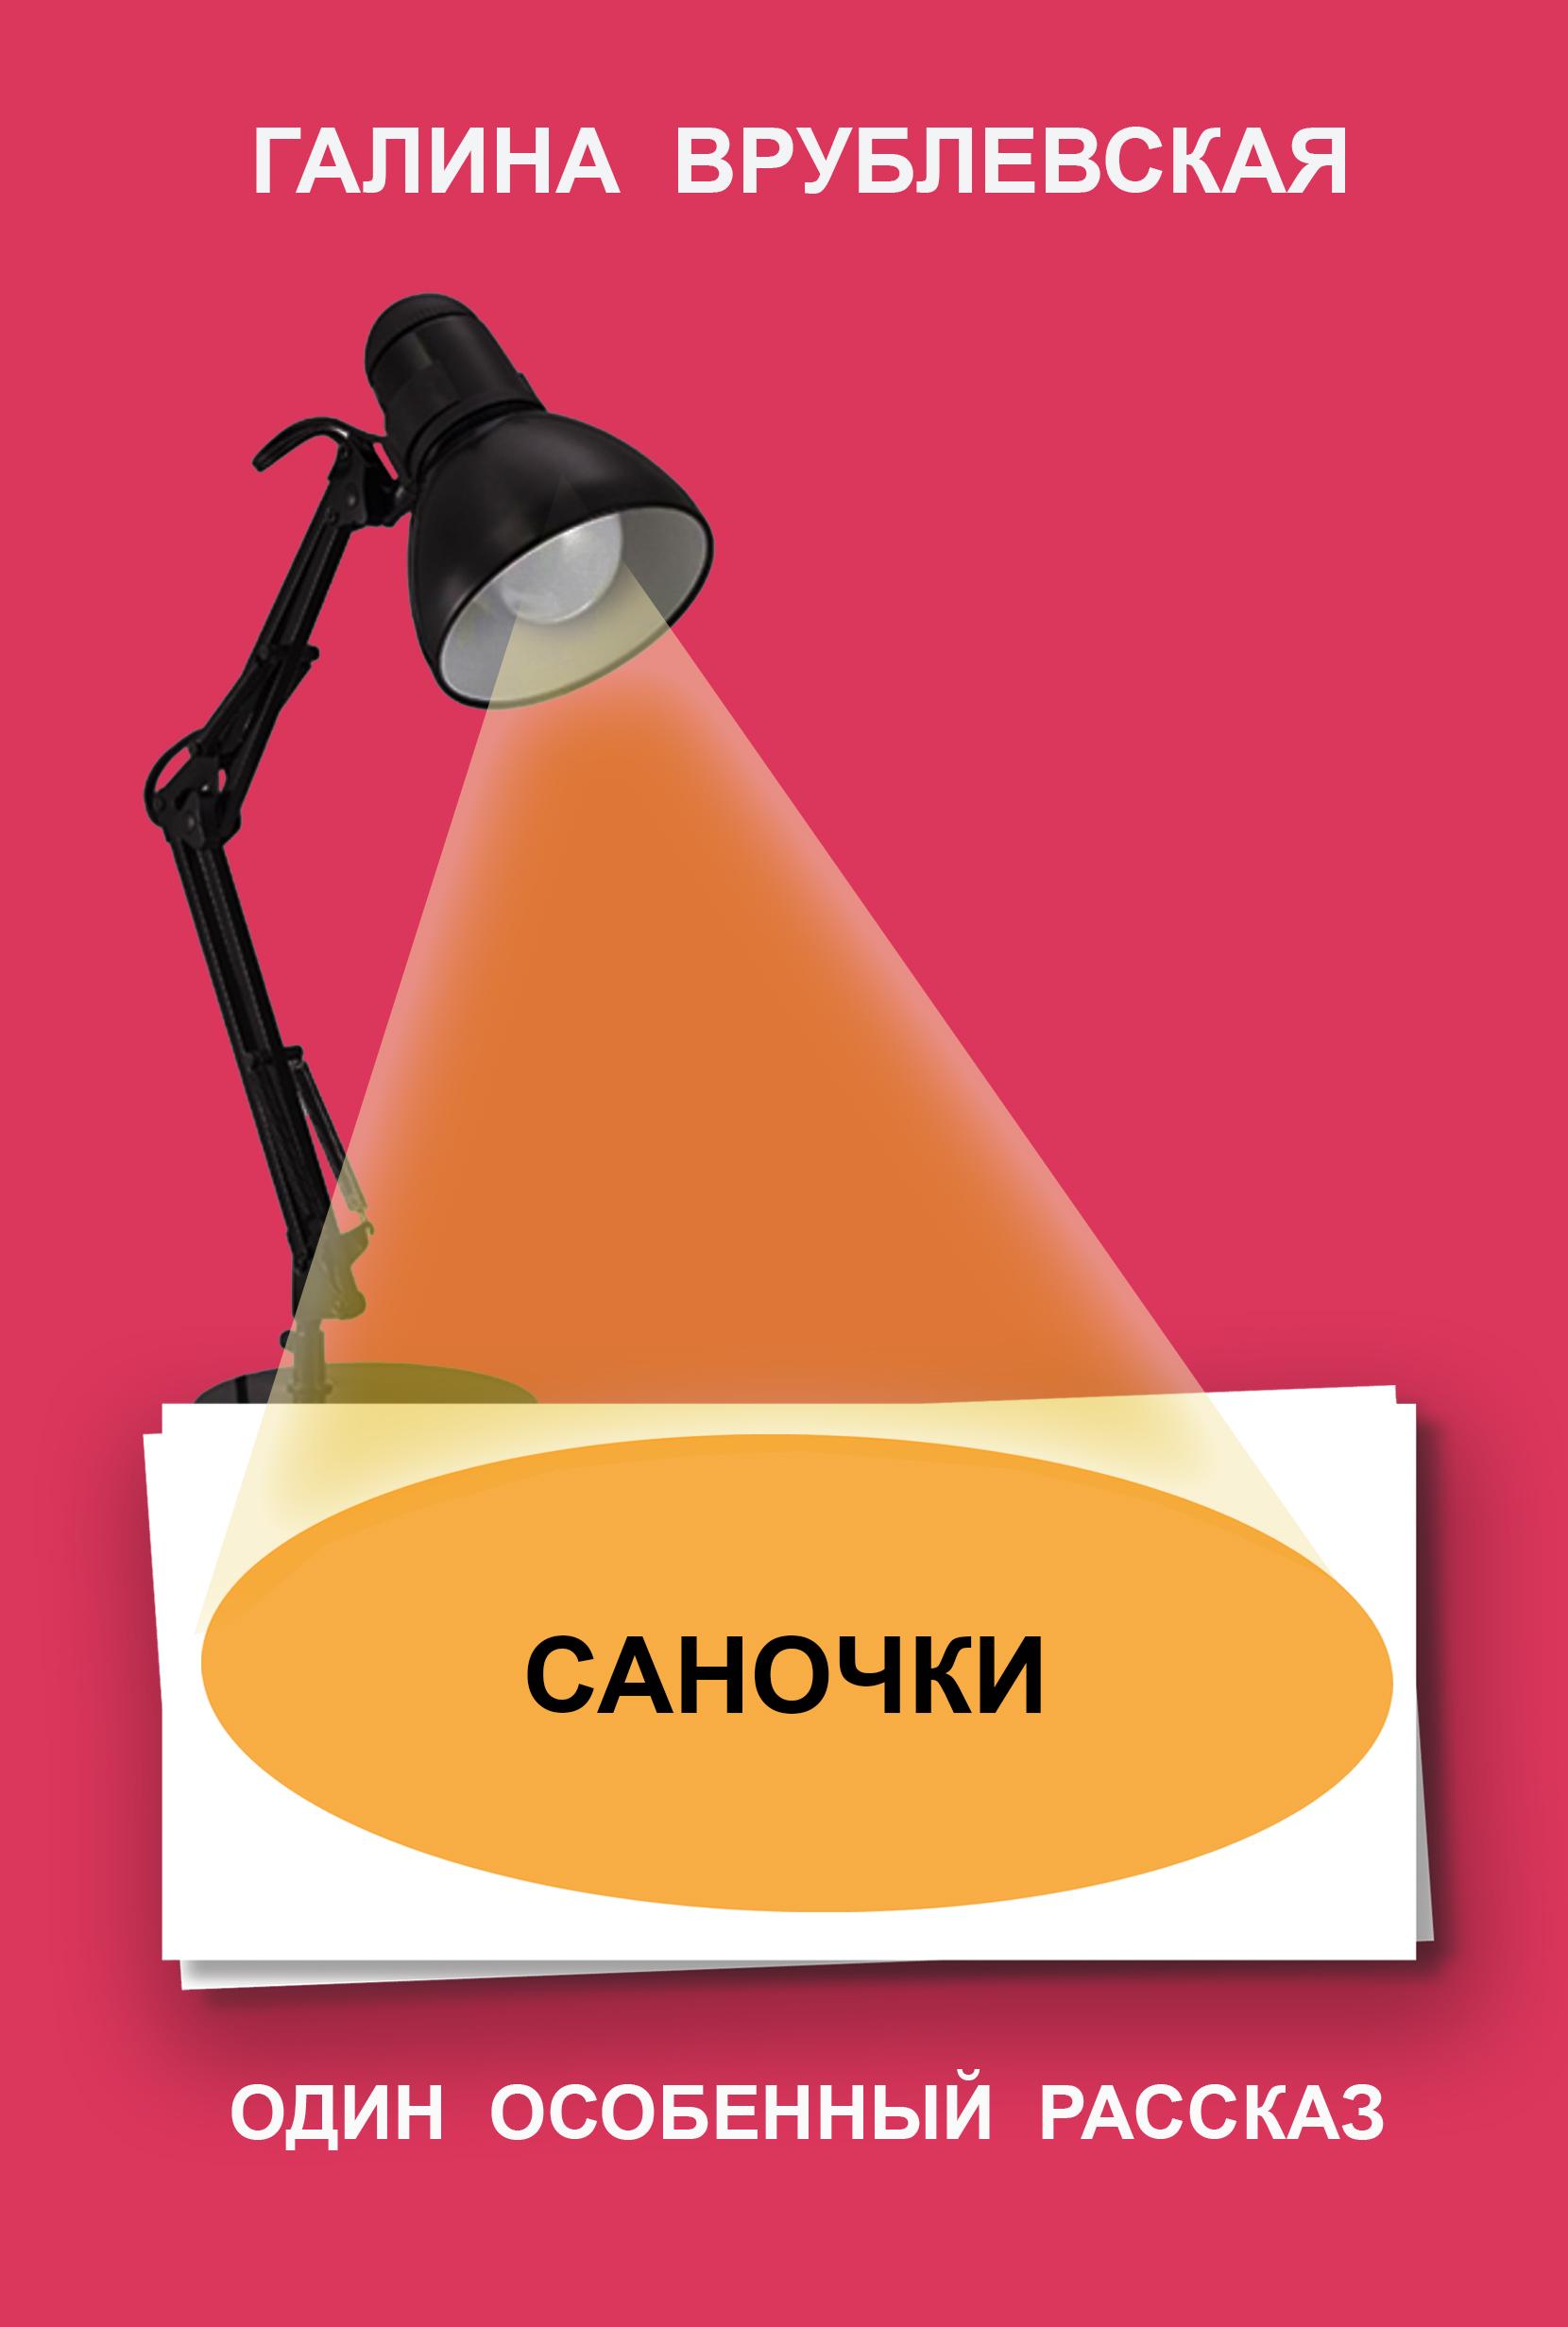 Галина Врублевская Саночки